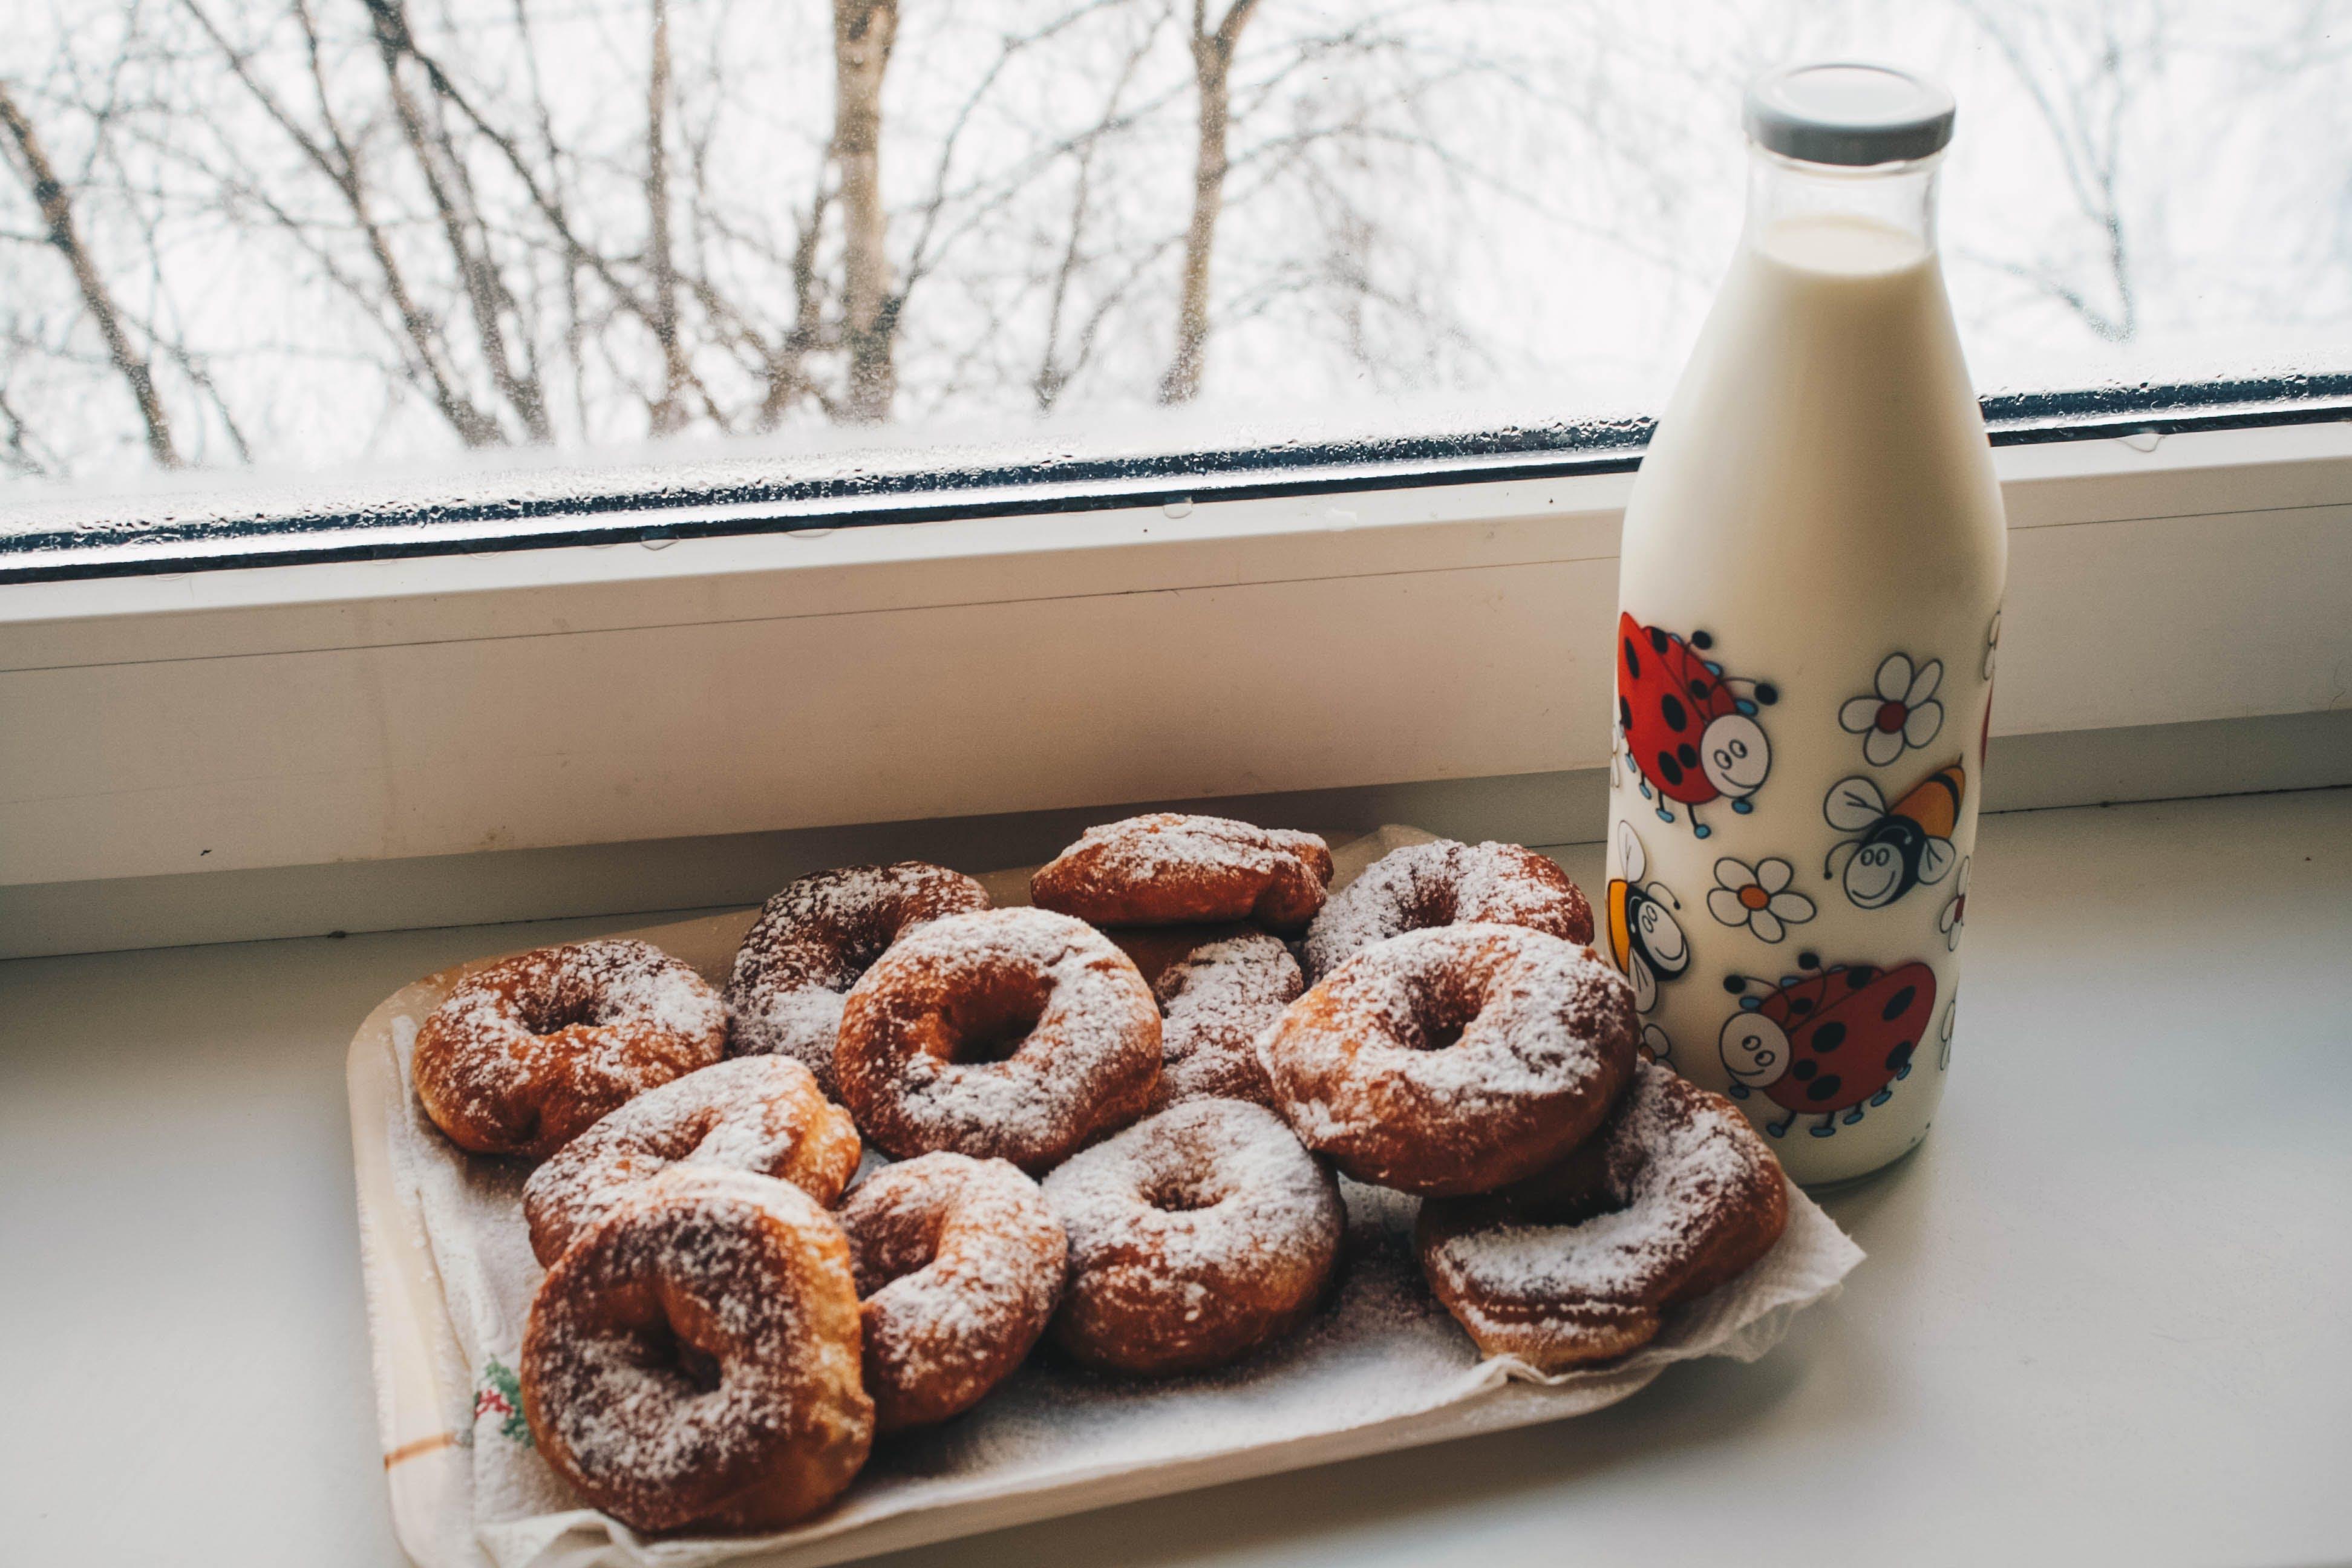 Doughnuts and Milk Bottle Near Clear Glass Window